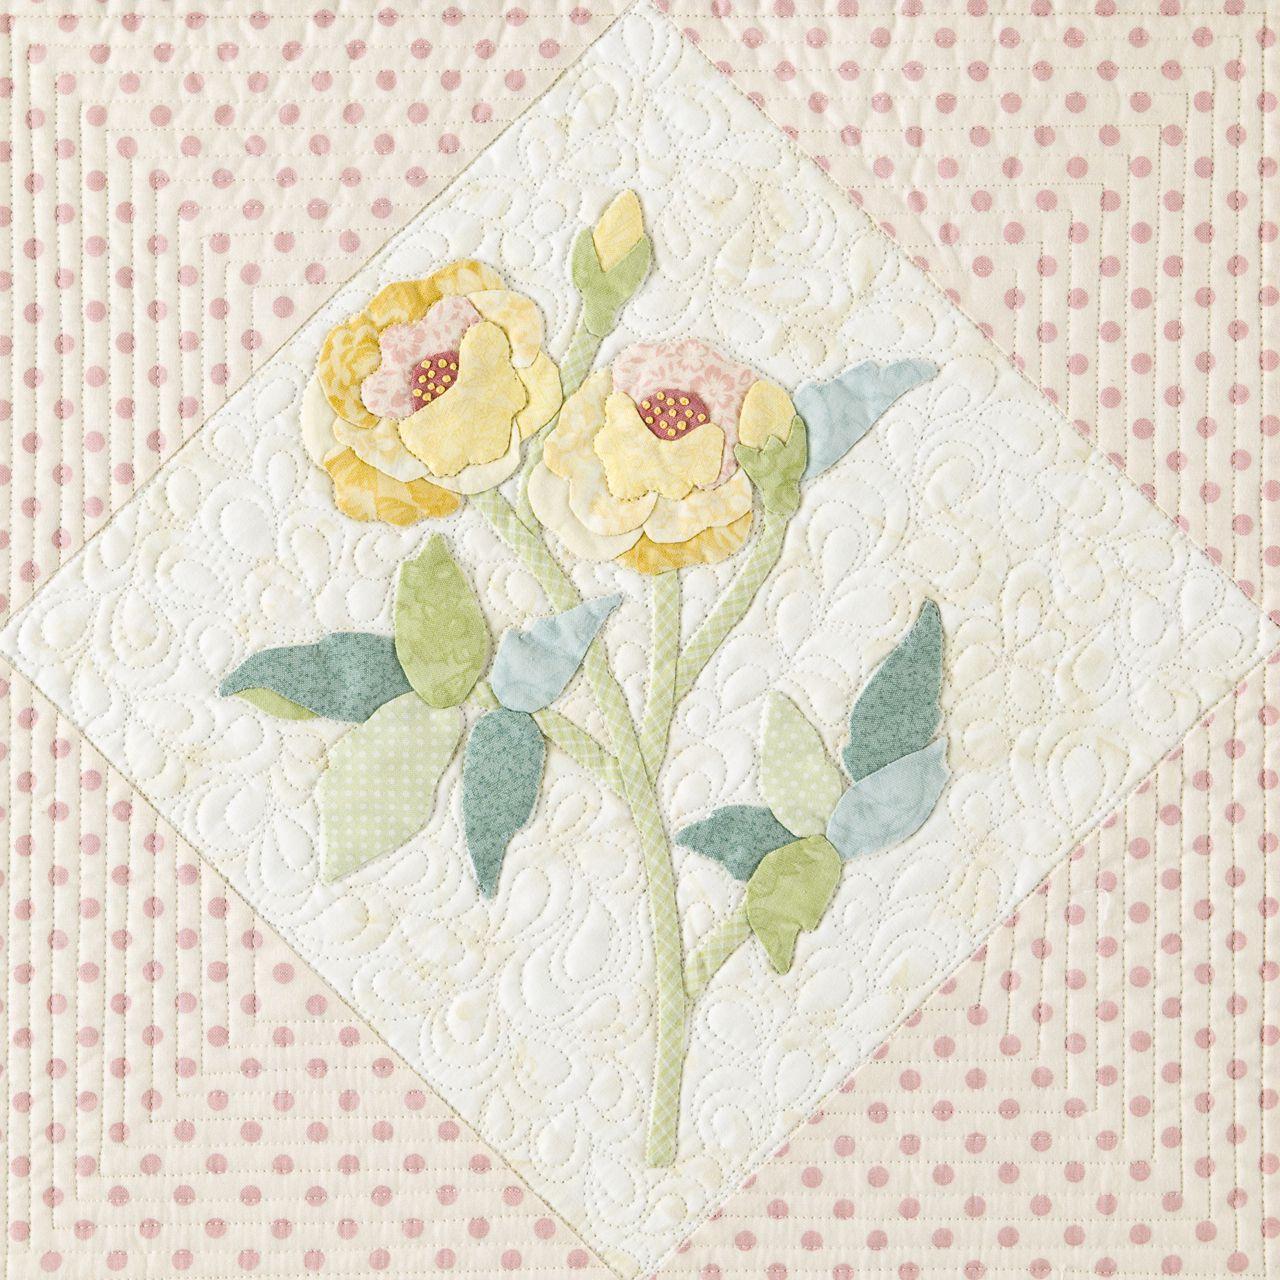 Vintage Spool Quilt Patterns